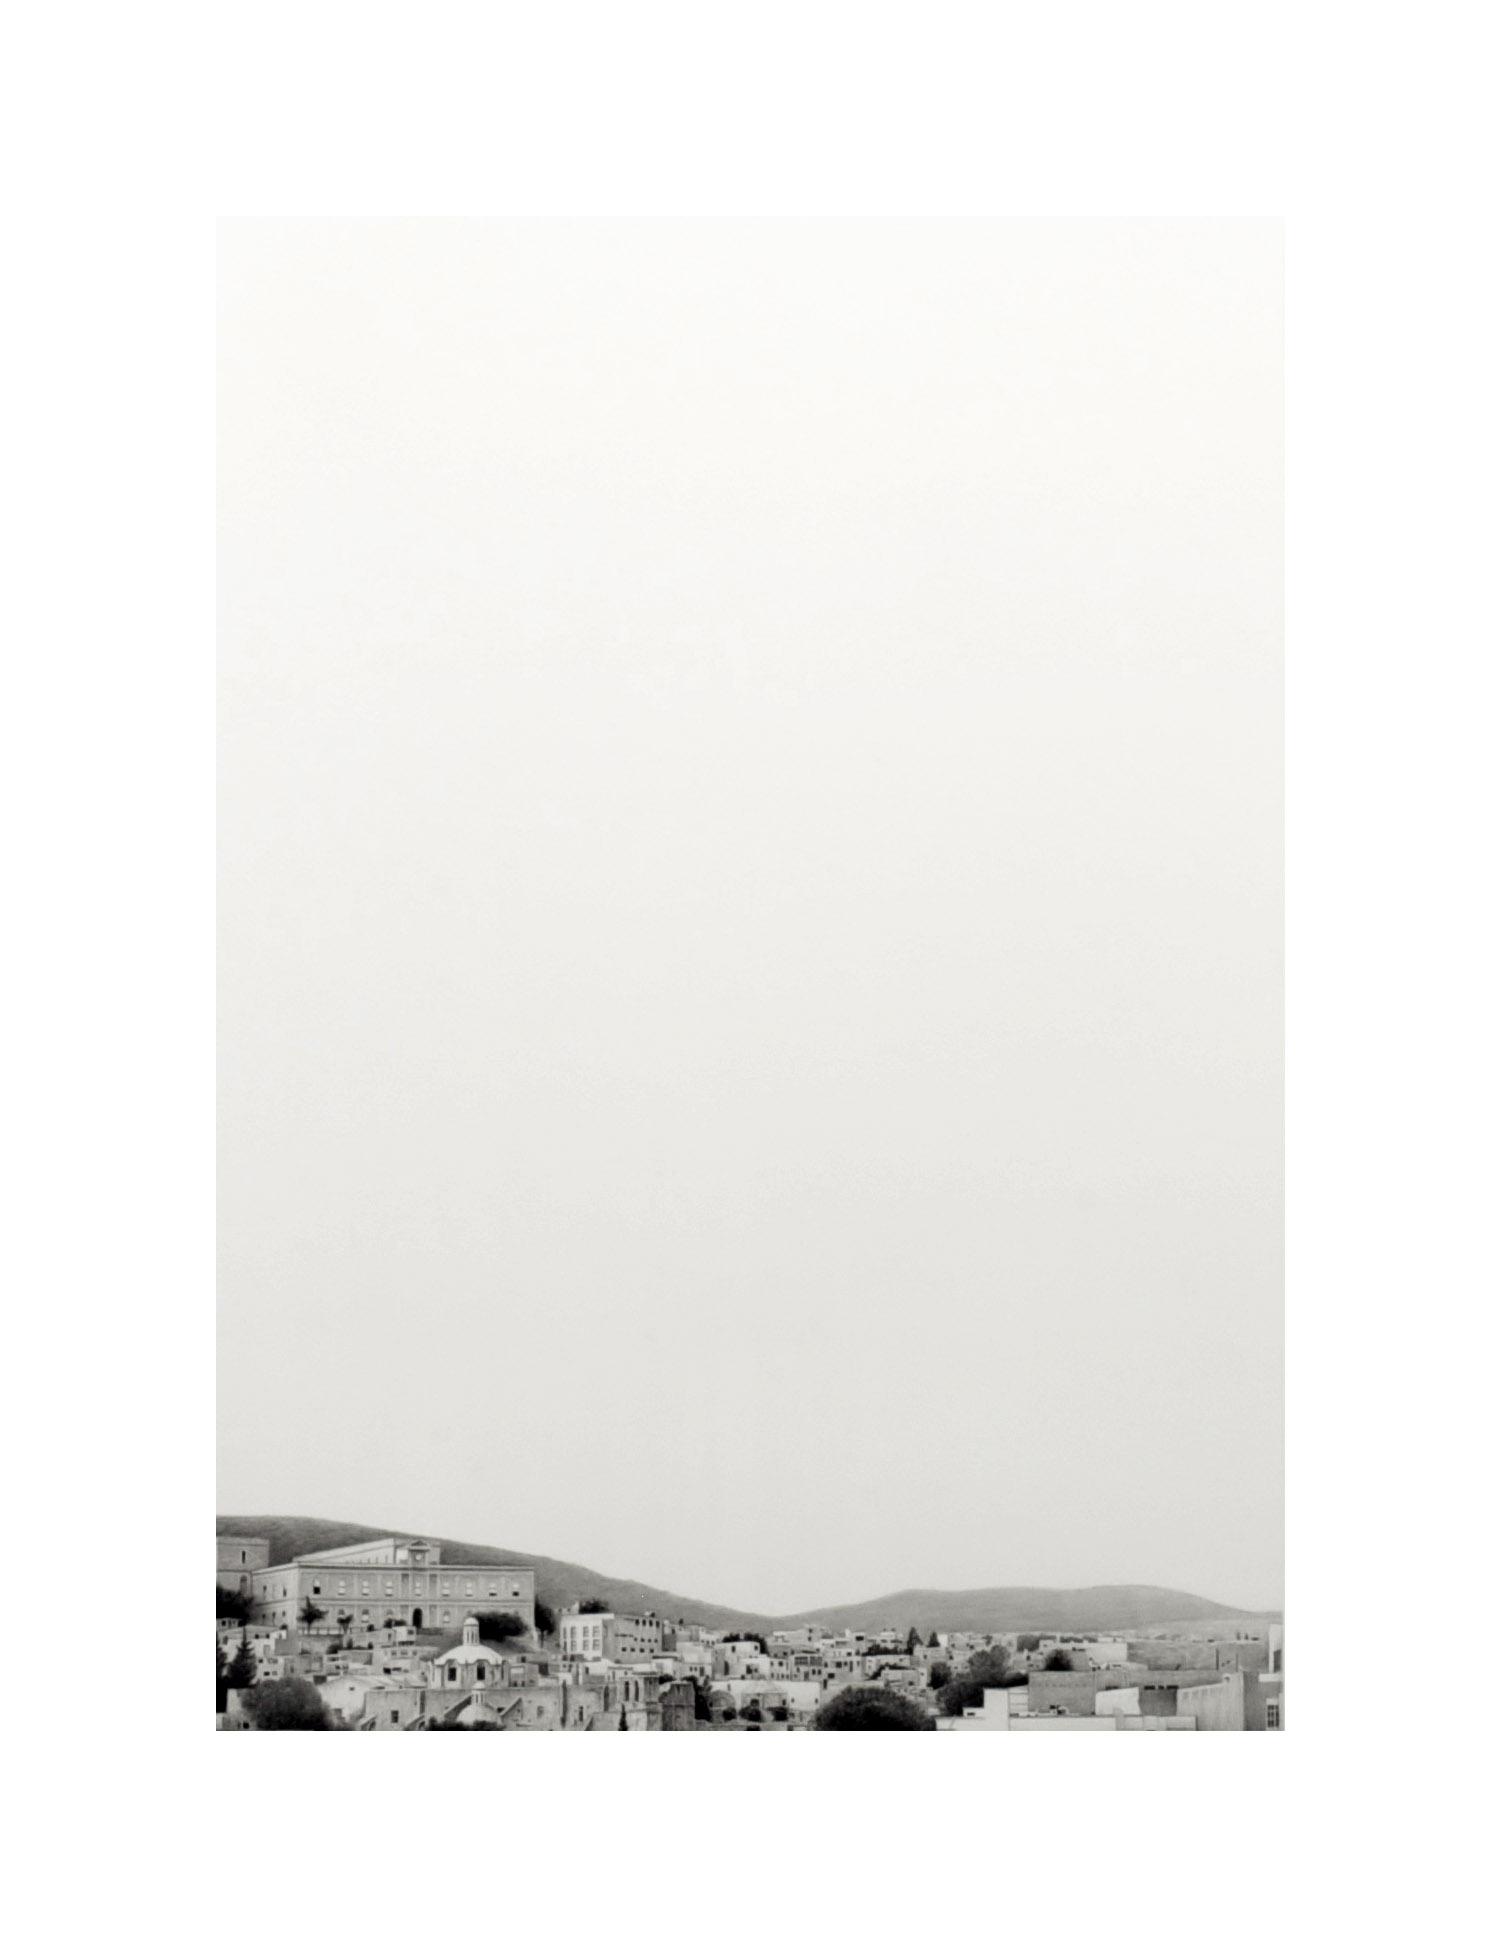 Cityscape # 2 Zacatecas, Mexico (Detail)